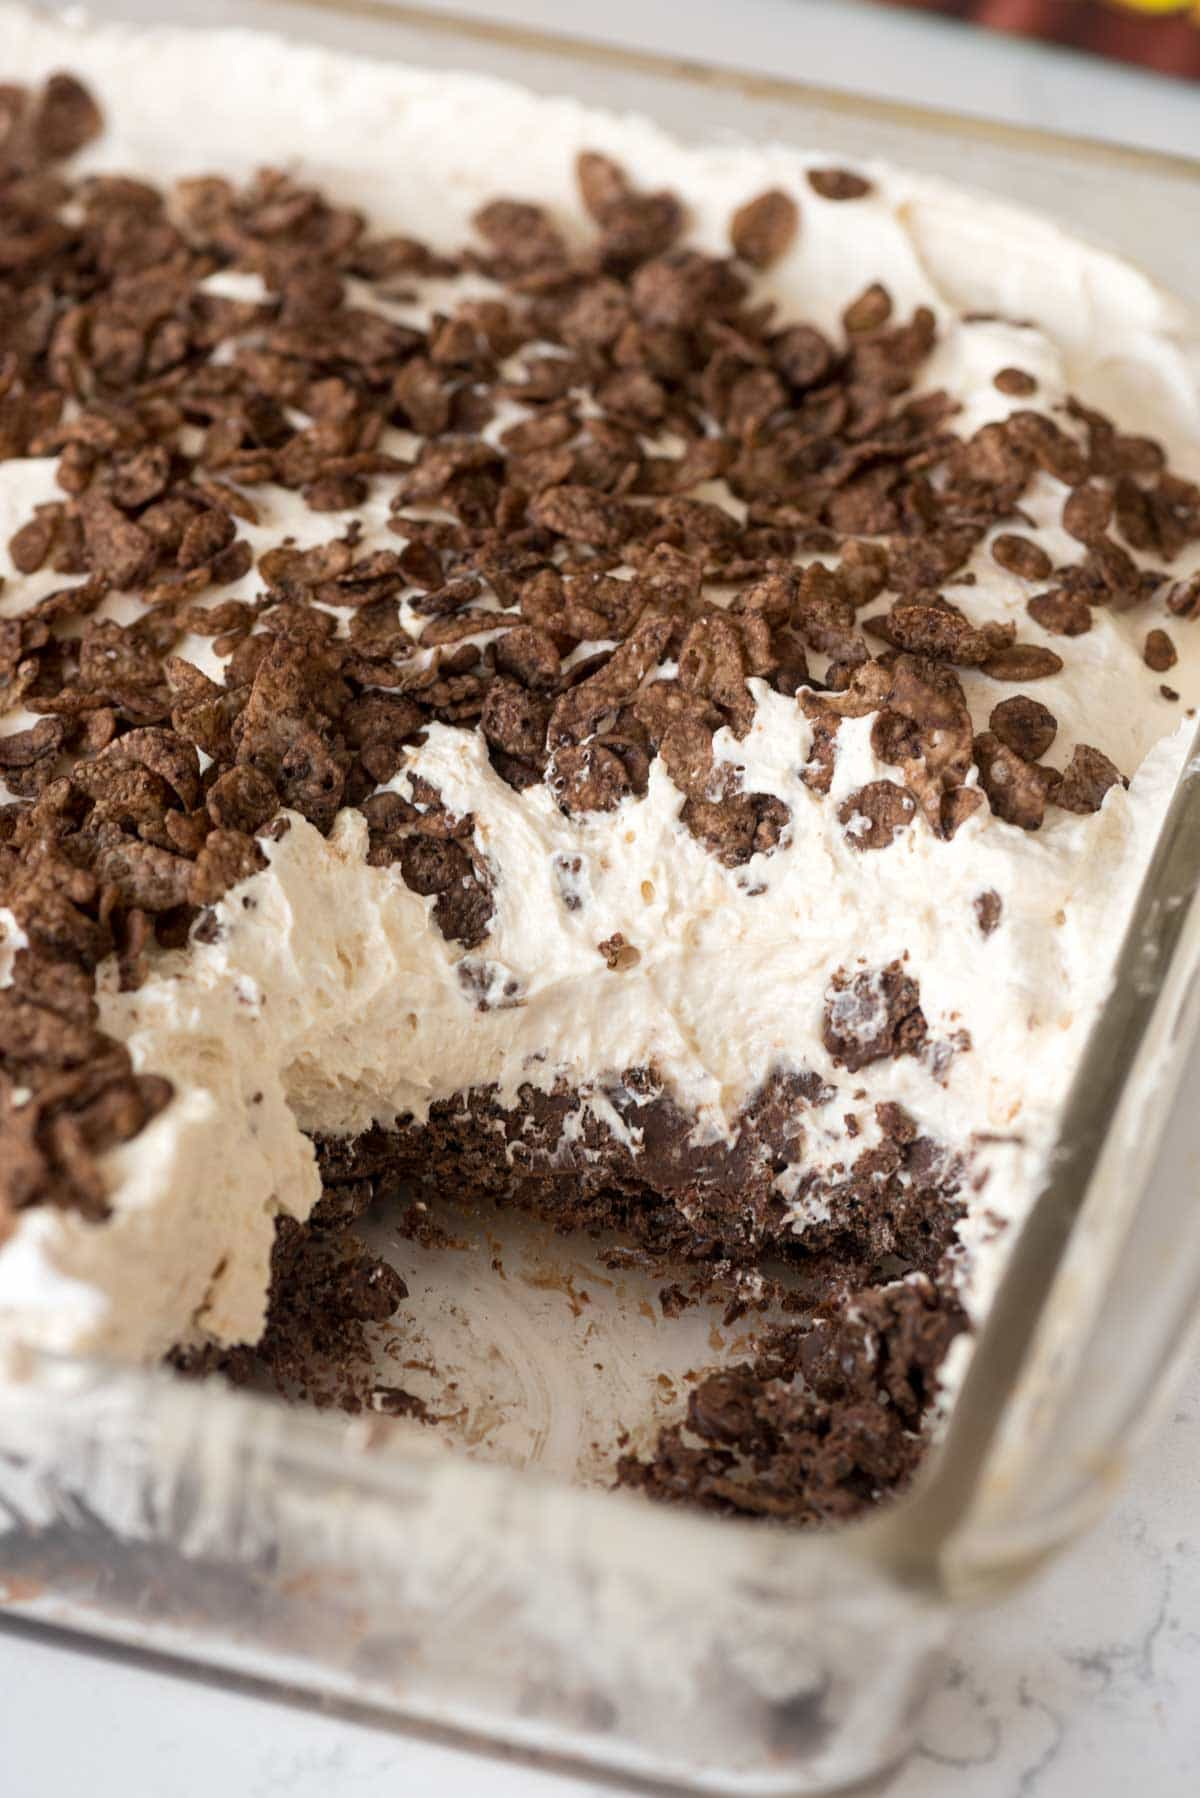 Easy Peanut Butter Cheesecake Cocoa Pebble No Bake Dessert